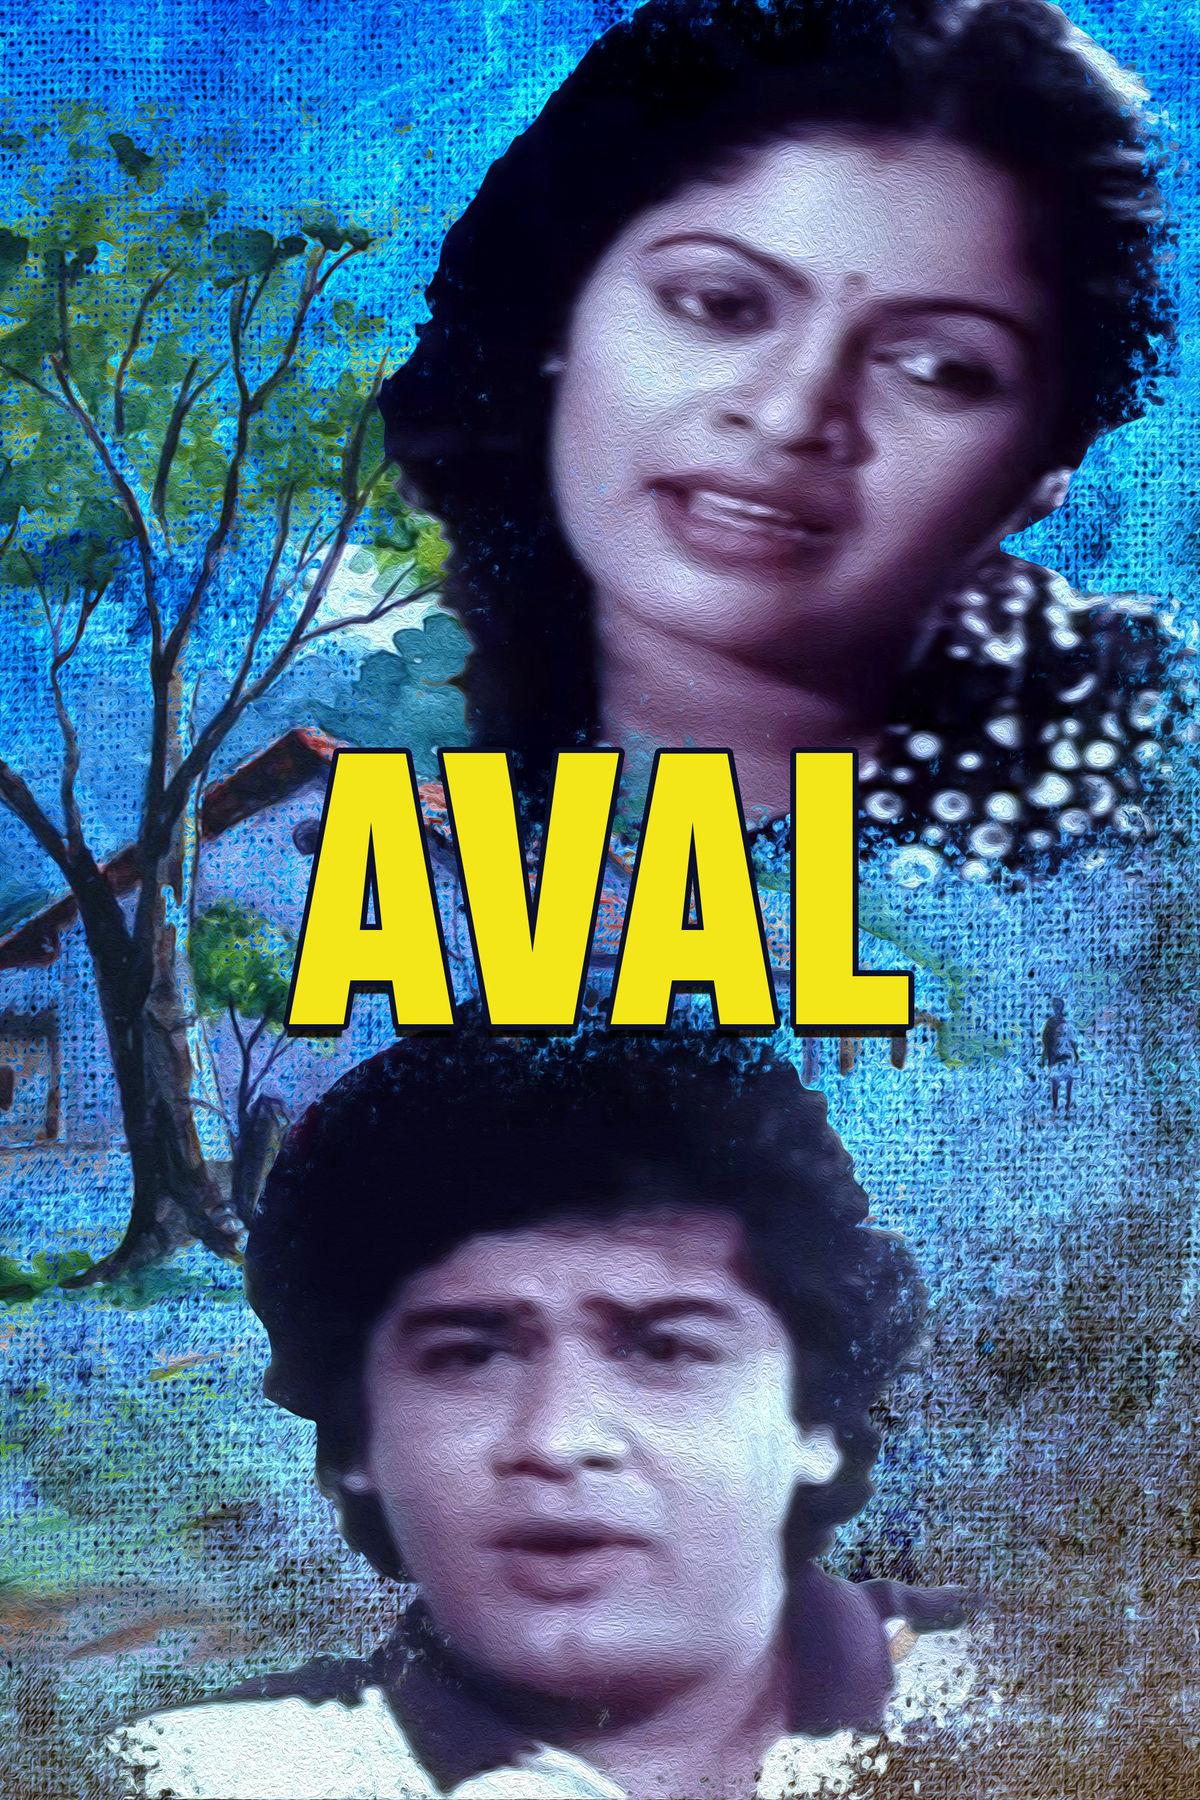 Kedamangalam Ali Best Movies, TV Shows and Web Series List